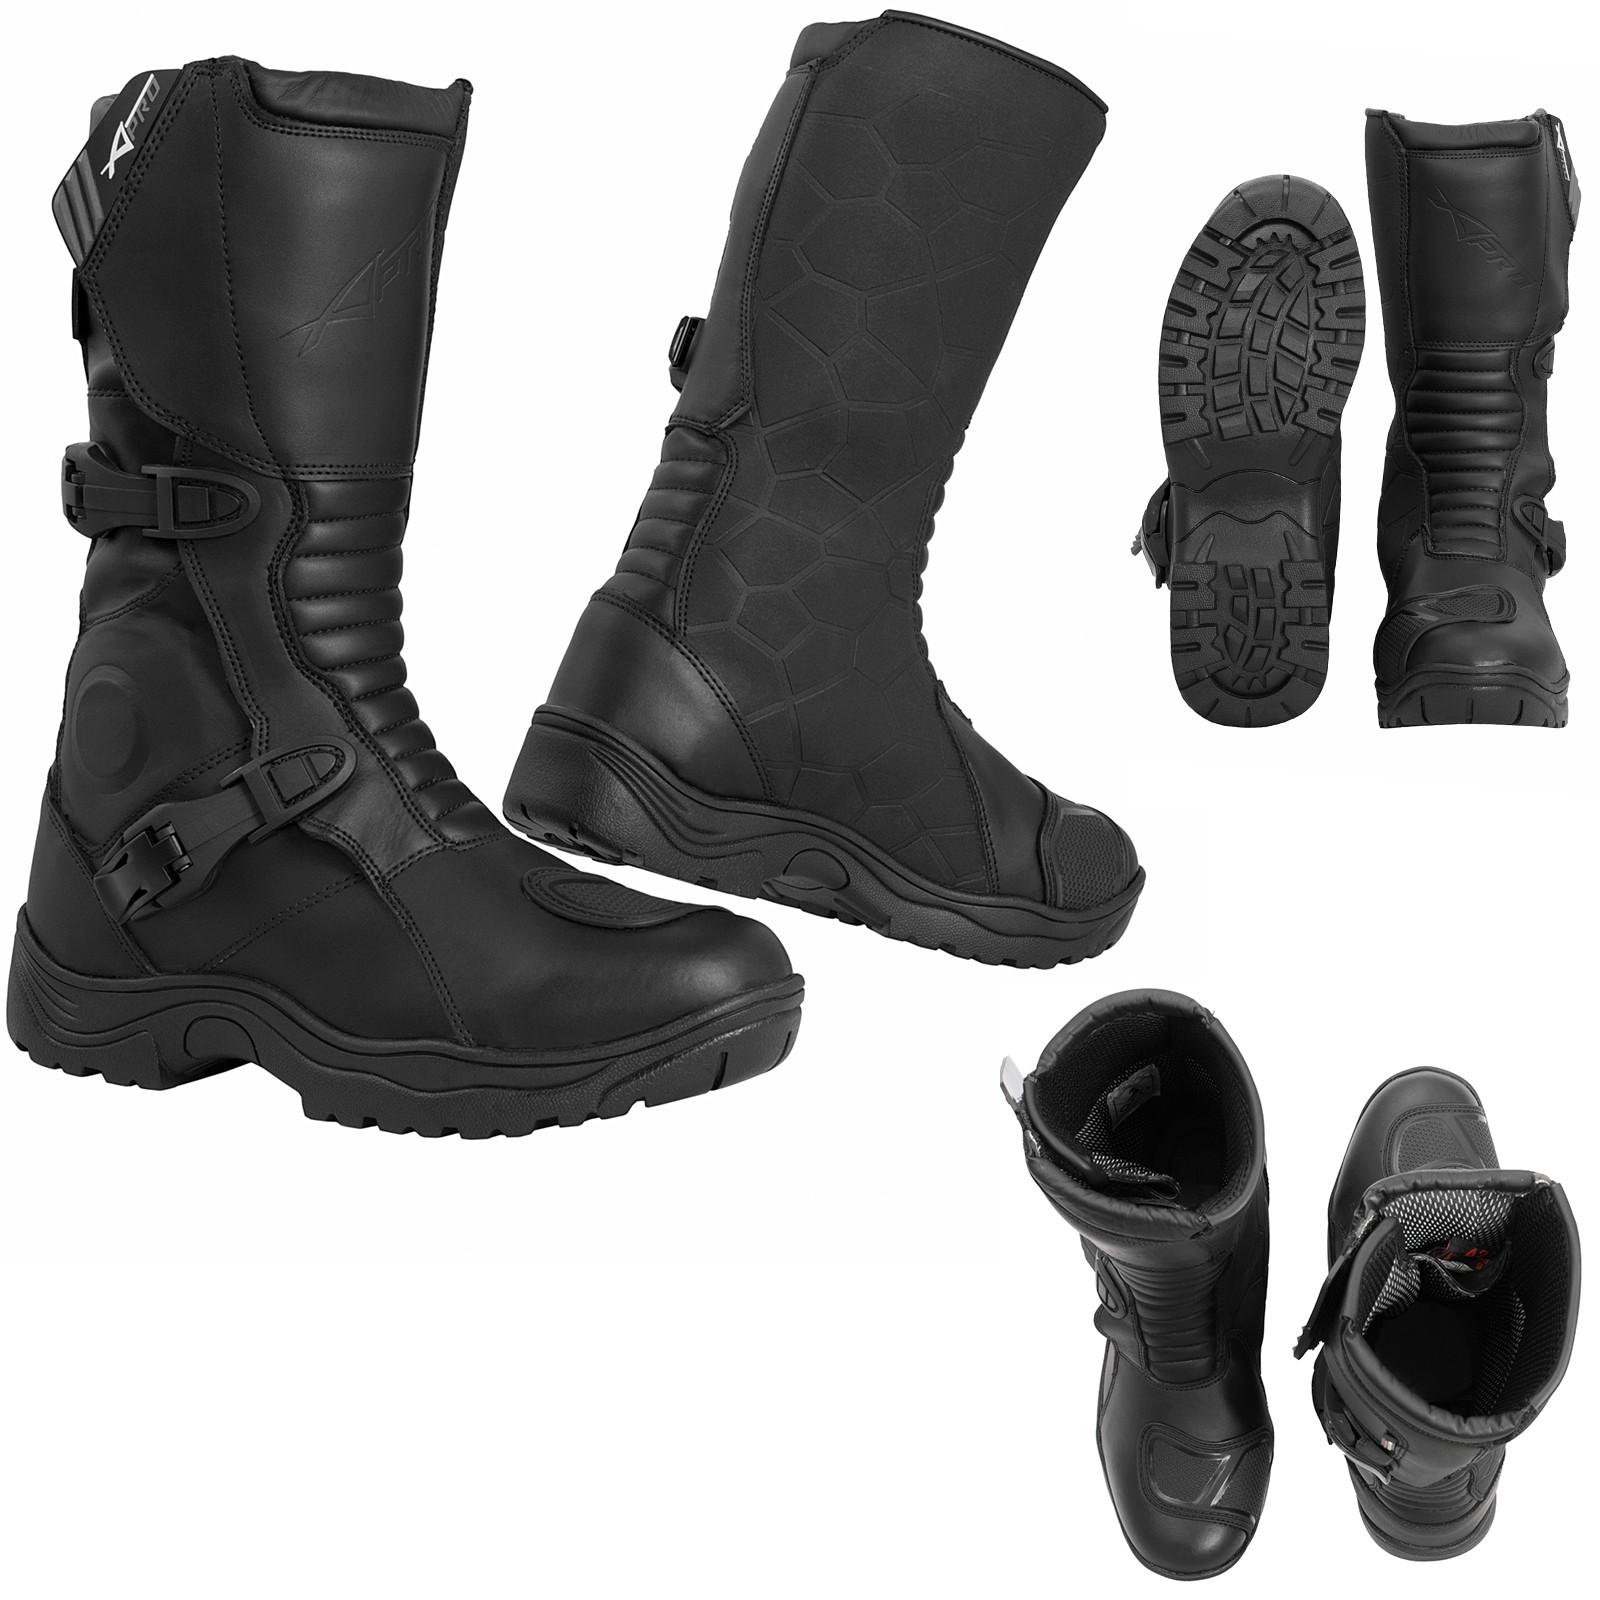 Vertigo-Boots-Stivaletti-Motorcycle-Nero-Black-A-Pro-Sonic-Moto-Set